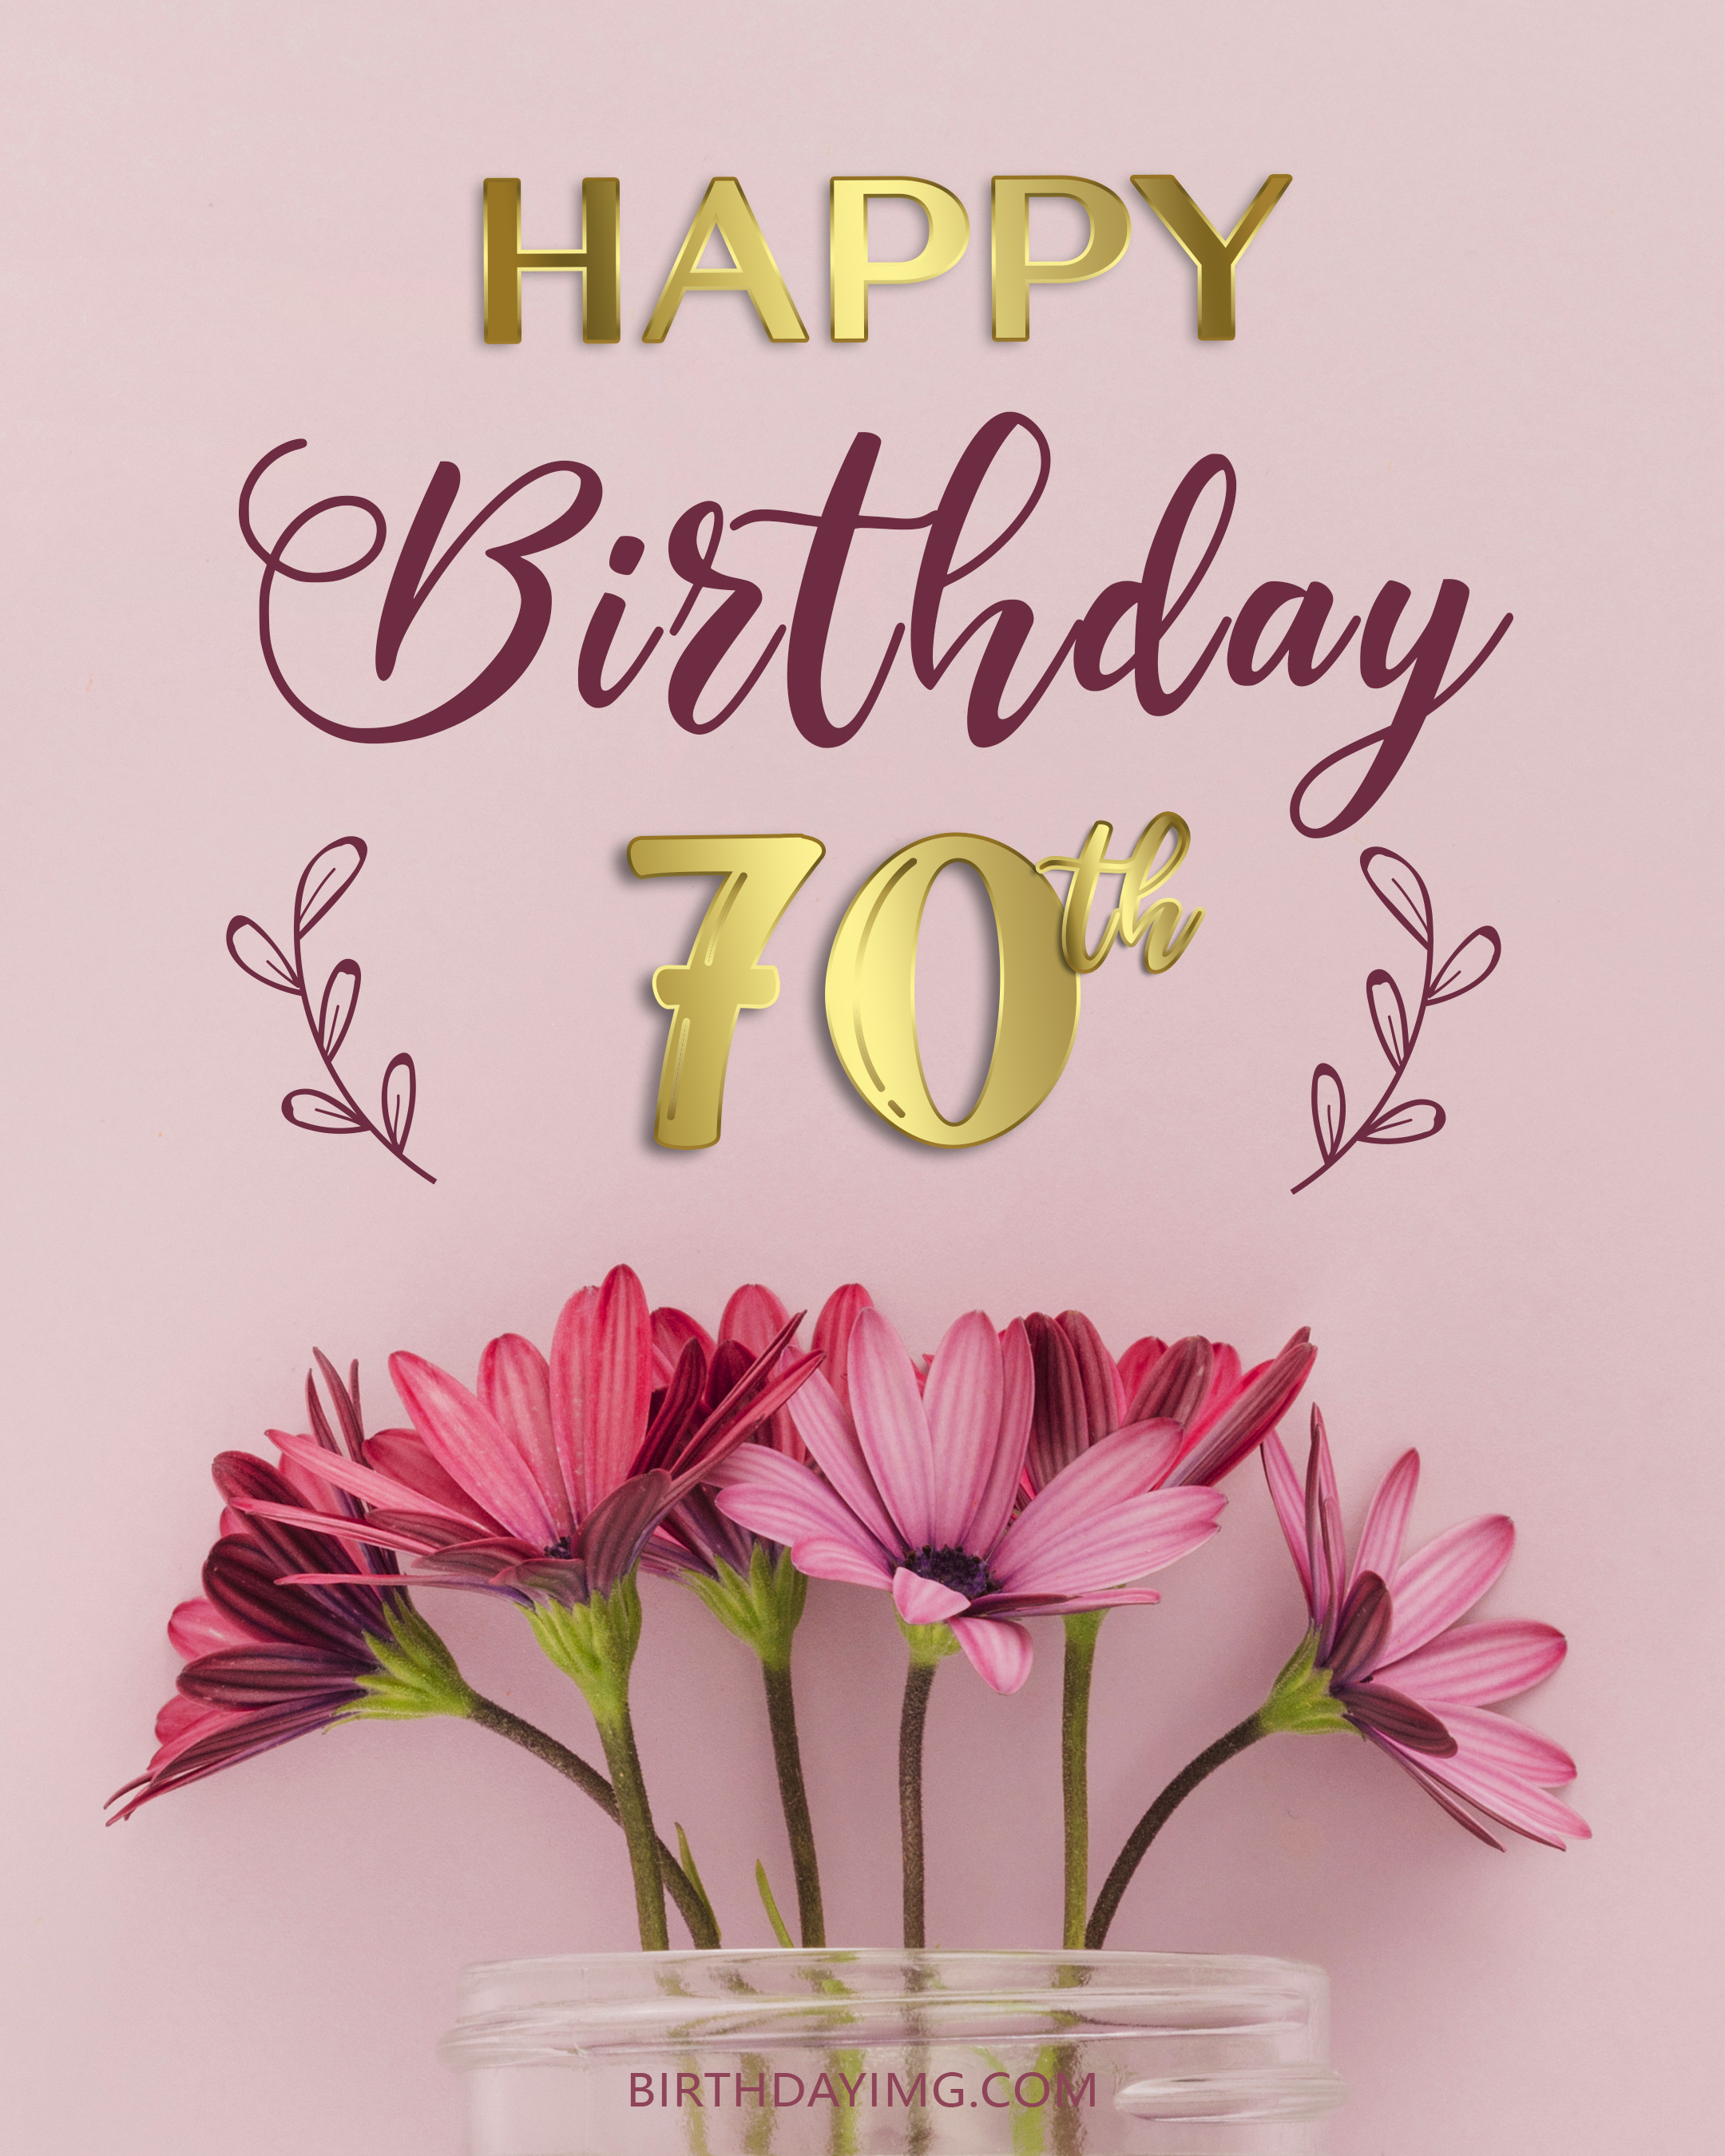 Free 70th Years Happy Birthday Image With Pink Flowers - birthdayimg.com